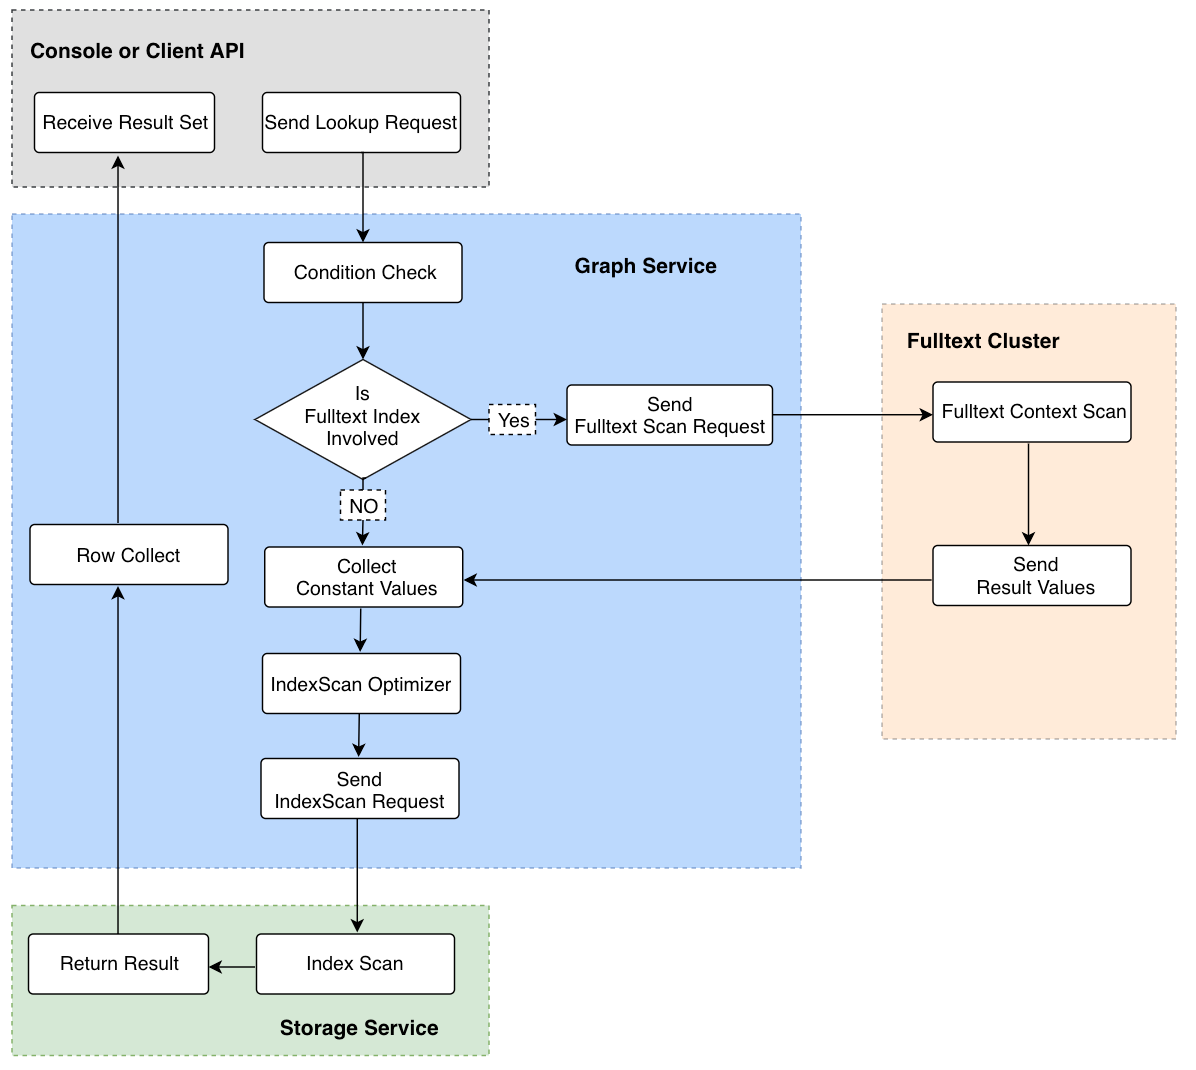 Querying Data Flow Diagram